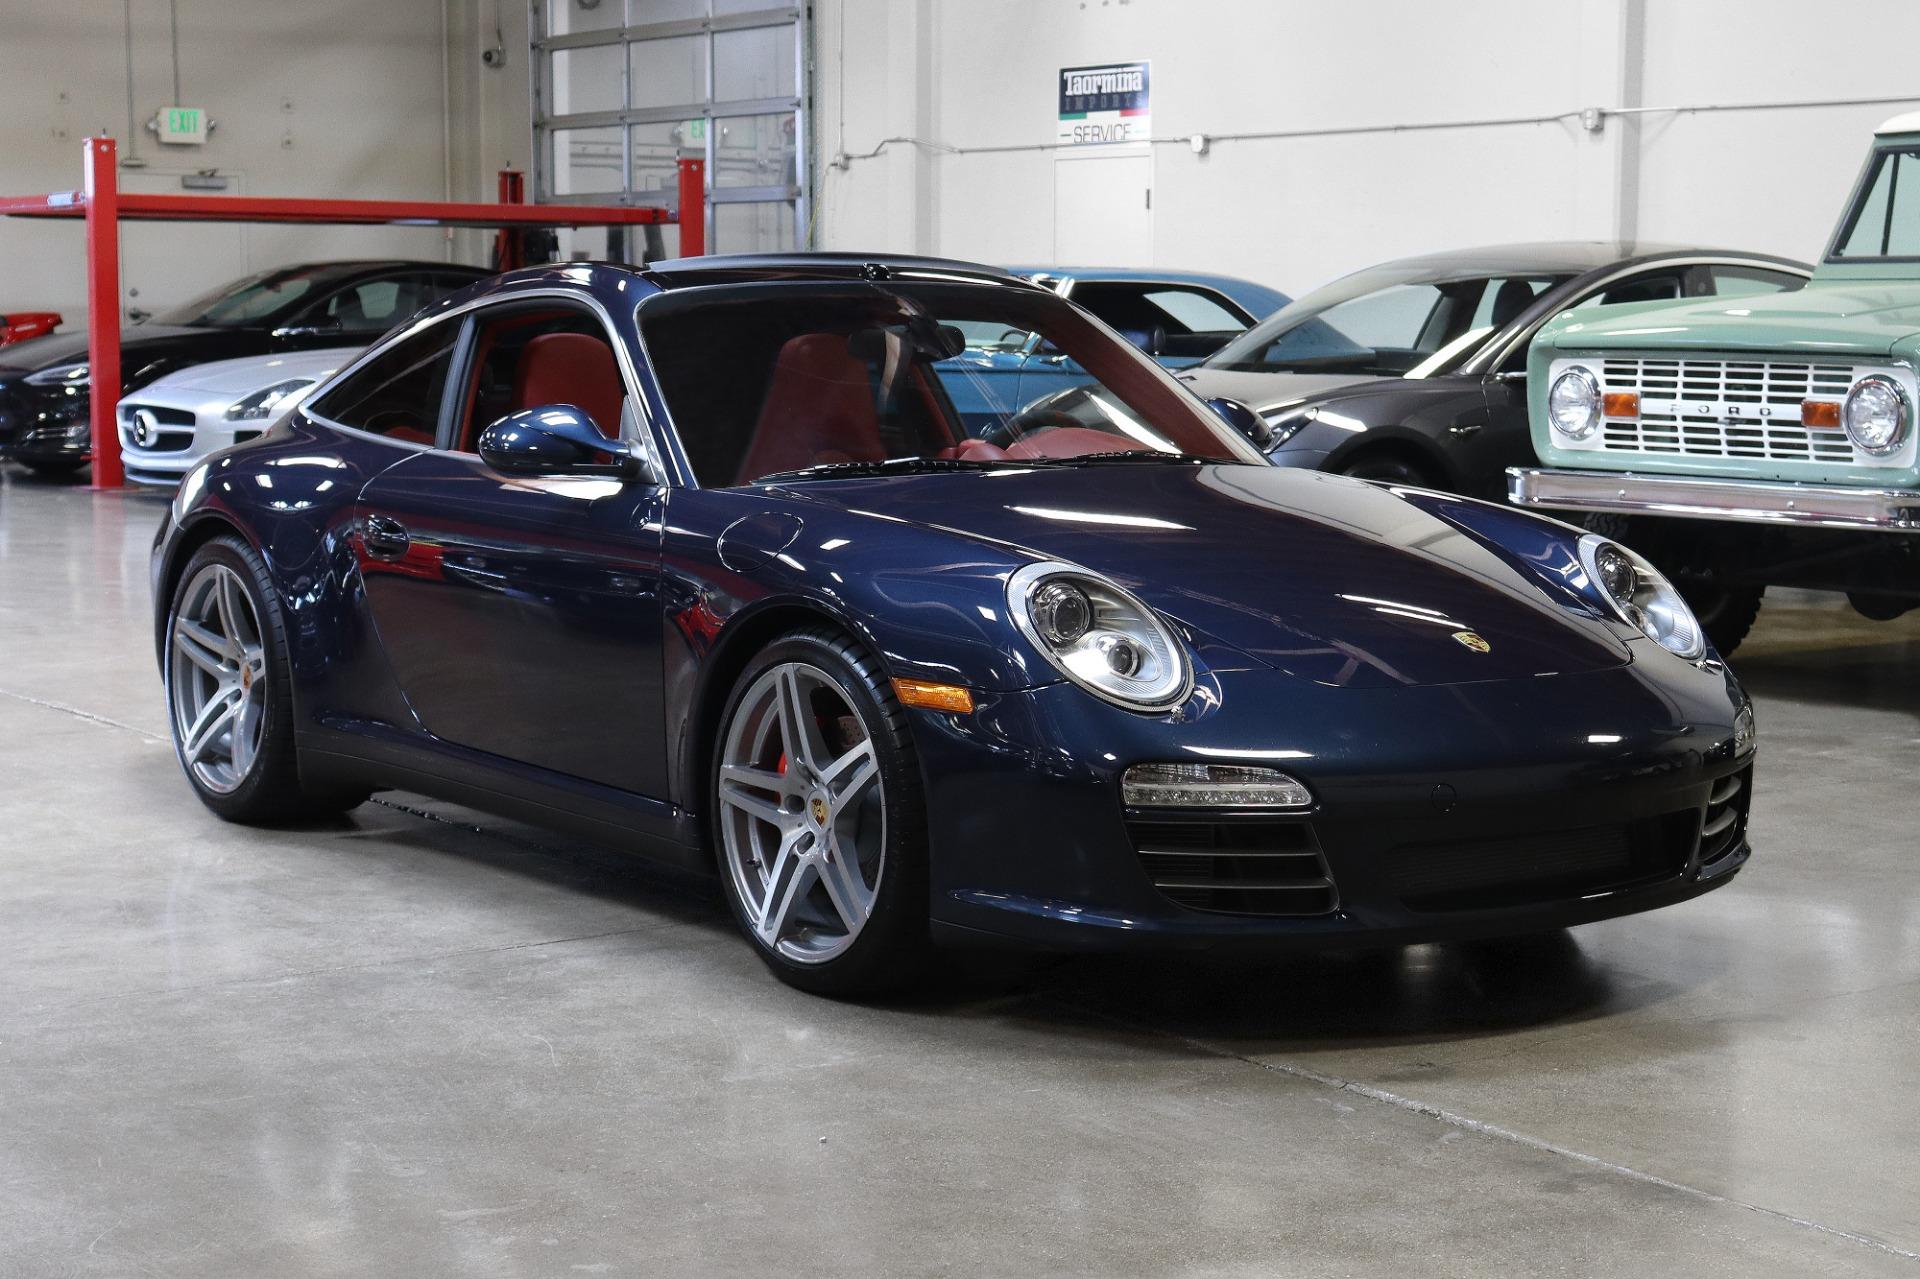 Used 2012 Porsche 911 Targa 4S for sale $103,995 at San Francisco Sports Cars in San Carlos CA 94070 1